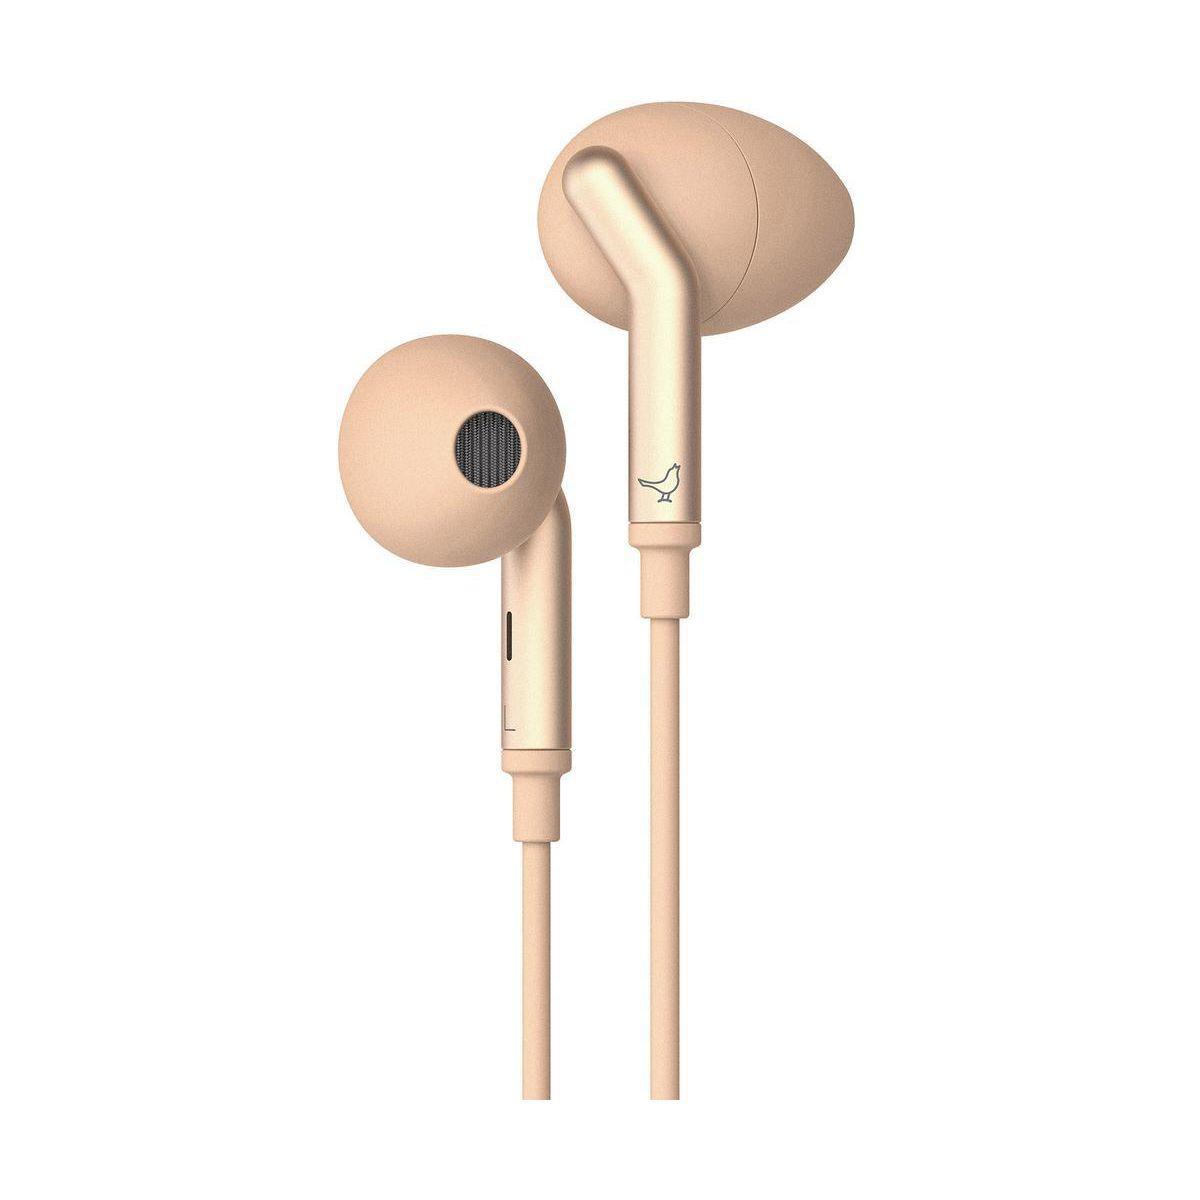 Ecouteurs libratone q adapt in-ear or - livraison offerte : code livrelais